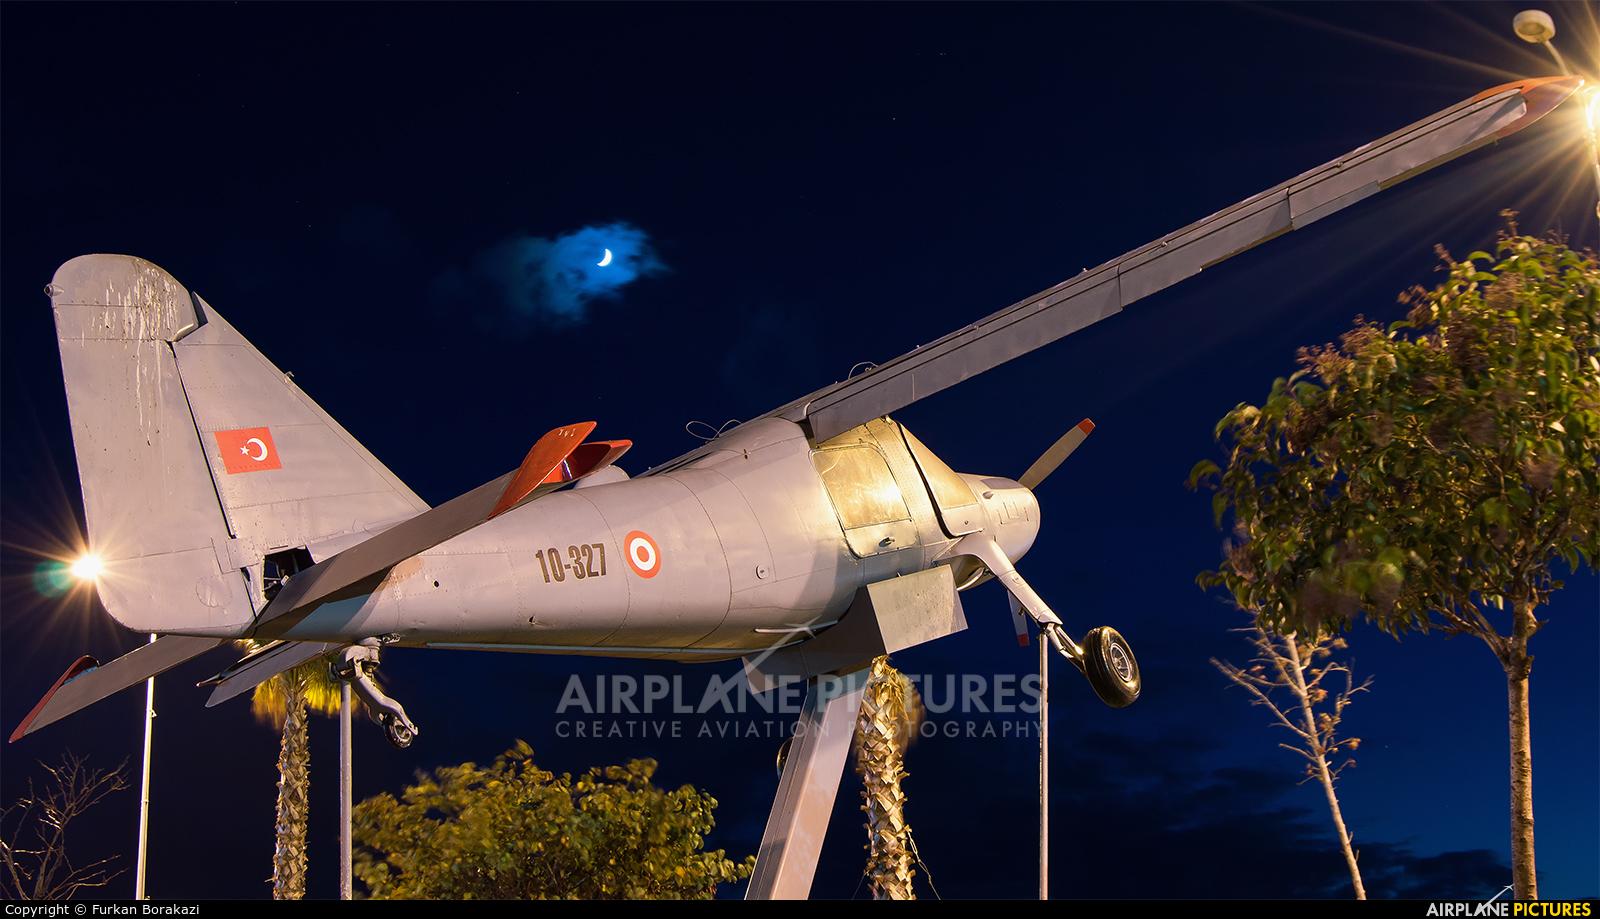 Turkey - Air Force 10-327 aircraft at Off Airport - Turkey